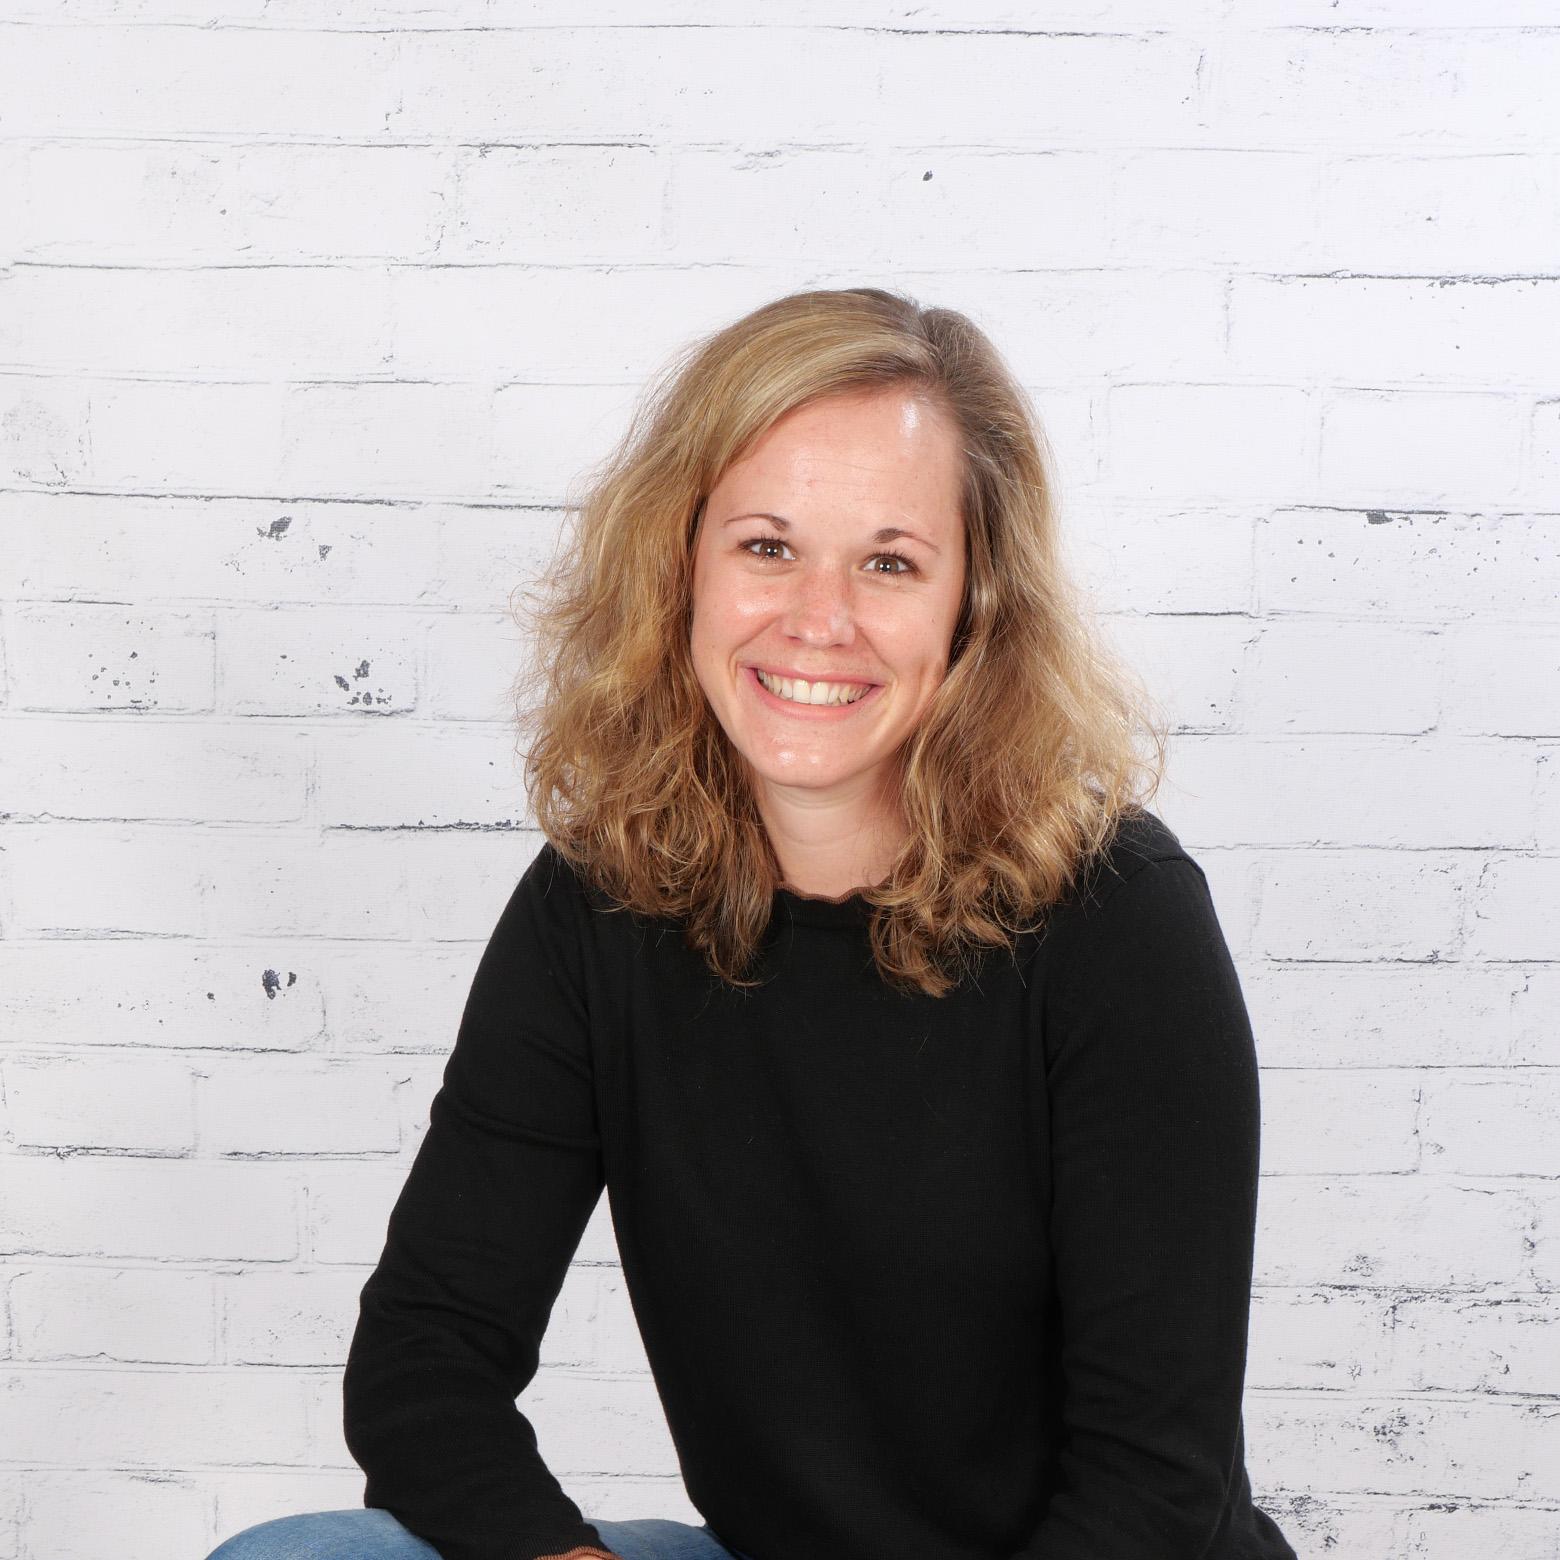 Profilbild von Carina Kuhn